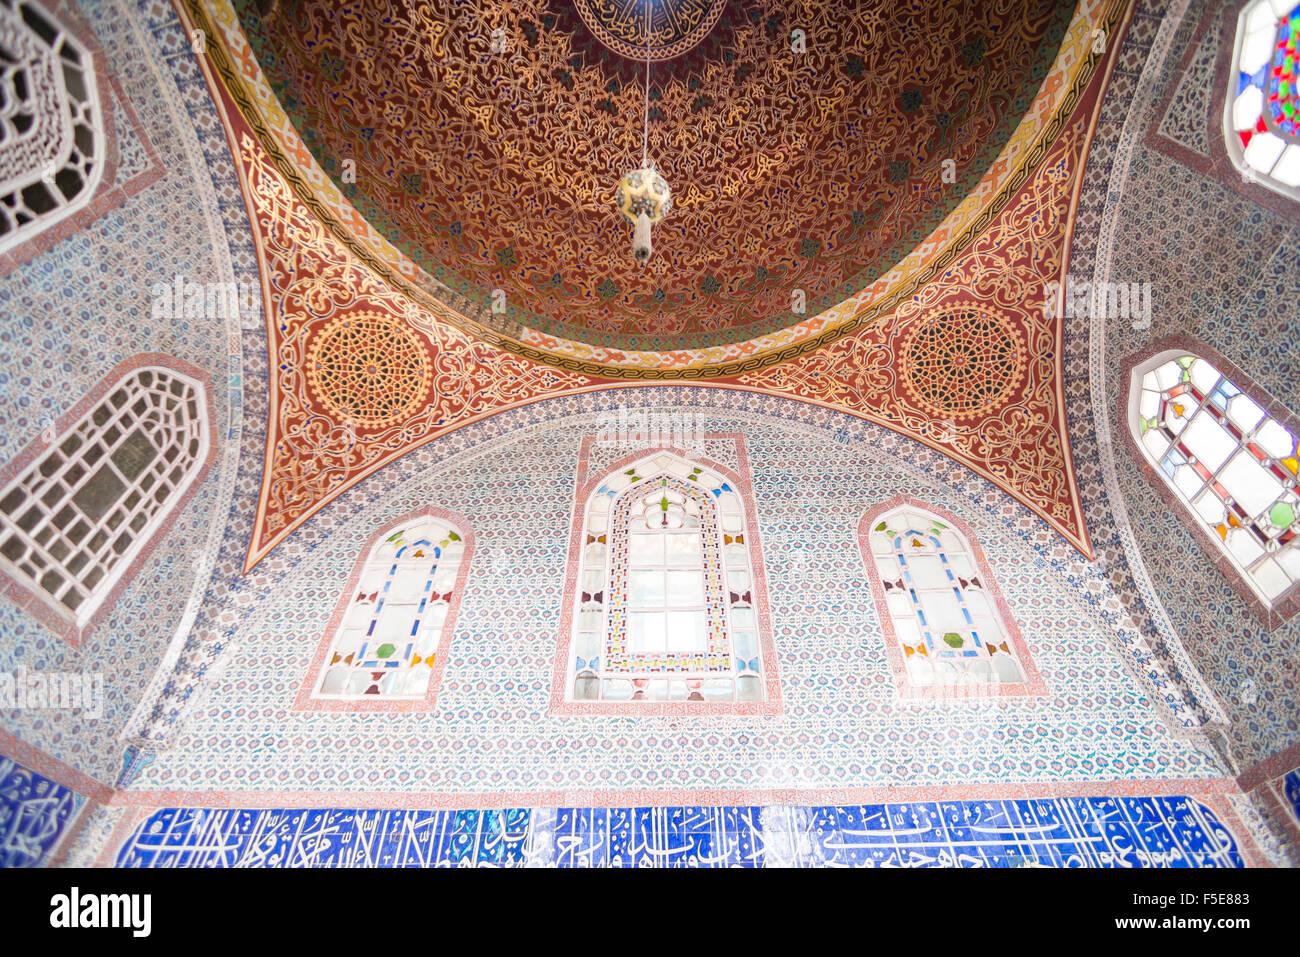 Summerhouse interior at Topkapi Palace, UNESCO World Heritage Site, Istanbul, Turkey, Europe - Stock Image